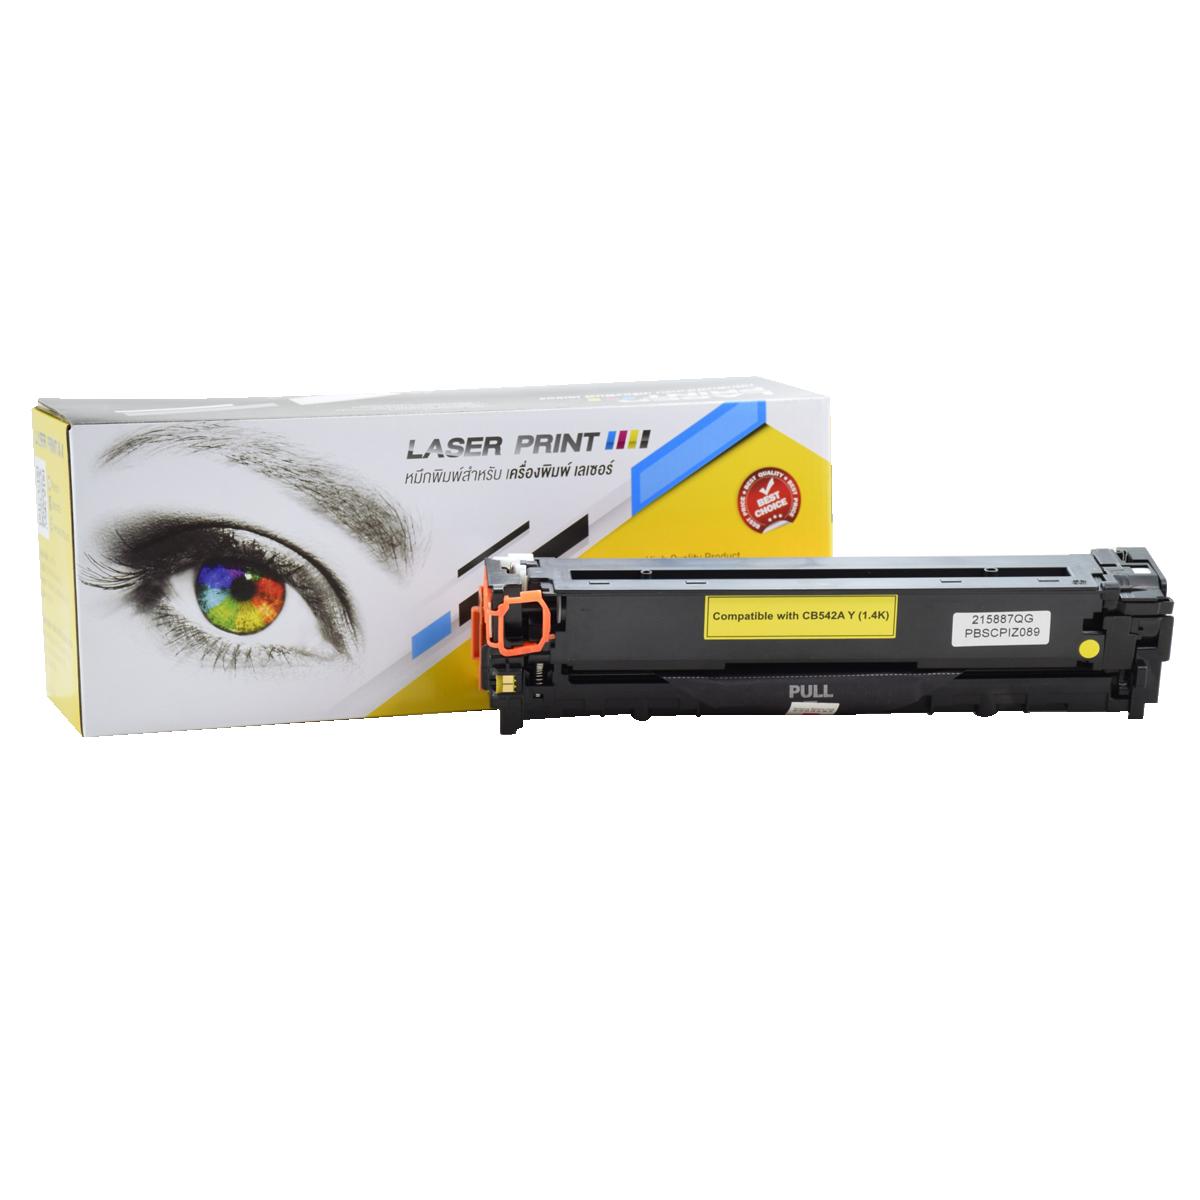 CB542A (HP 125A) /Canon Cartridge 316/416Y 1.4k Laserprint Yellow